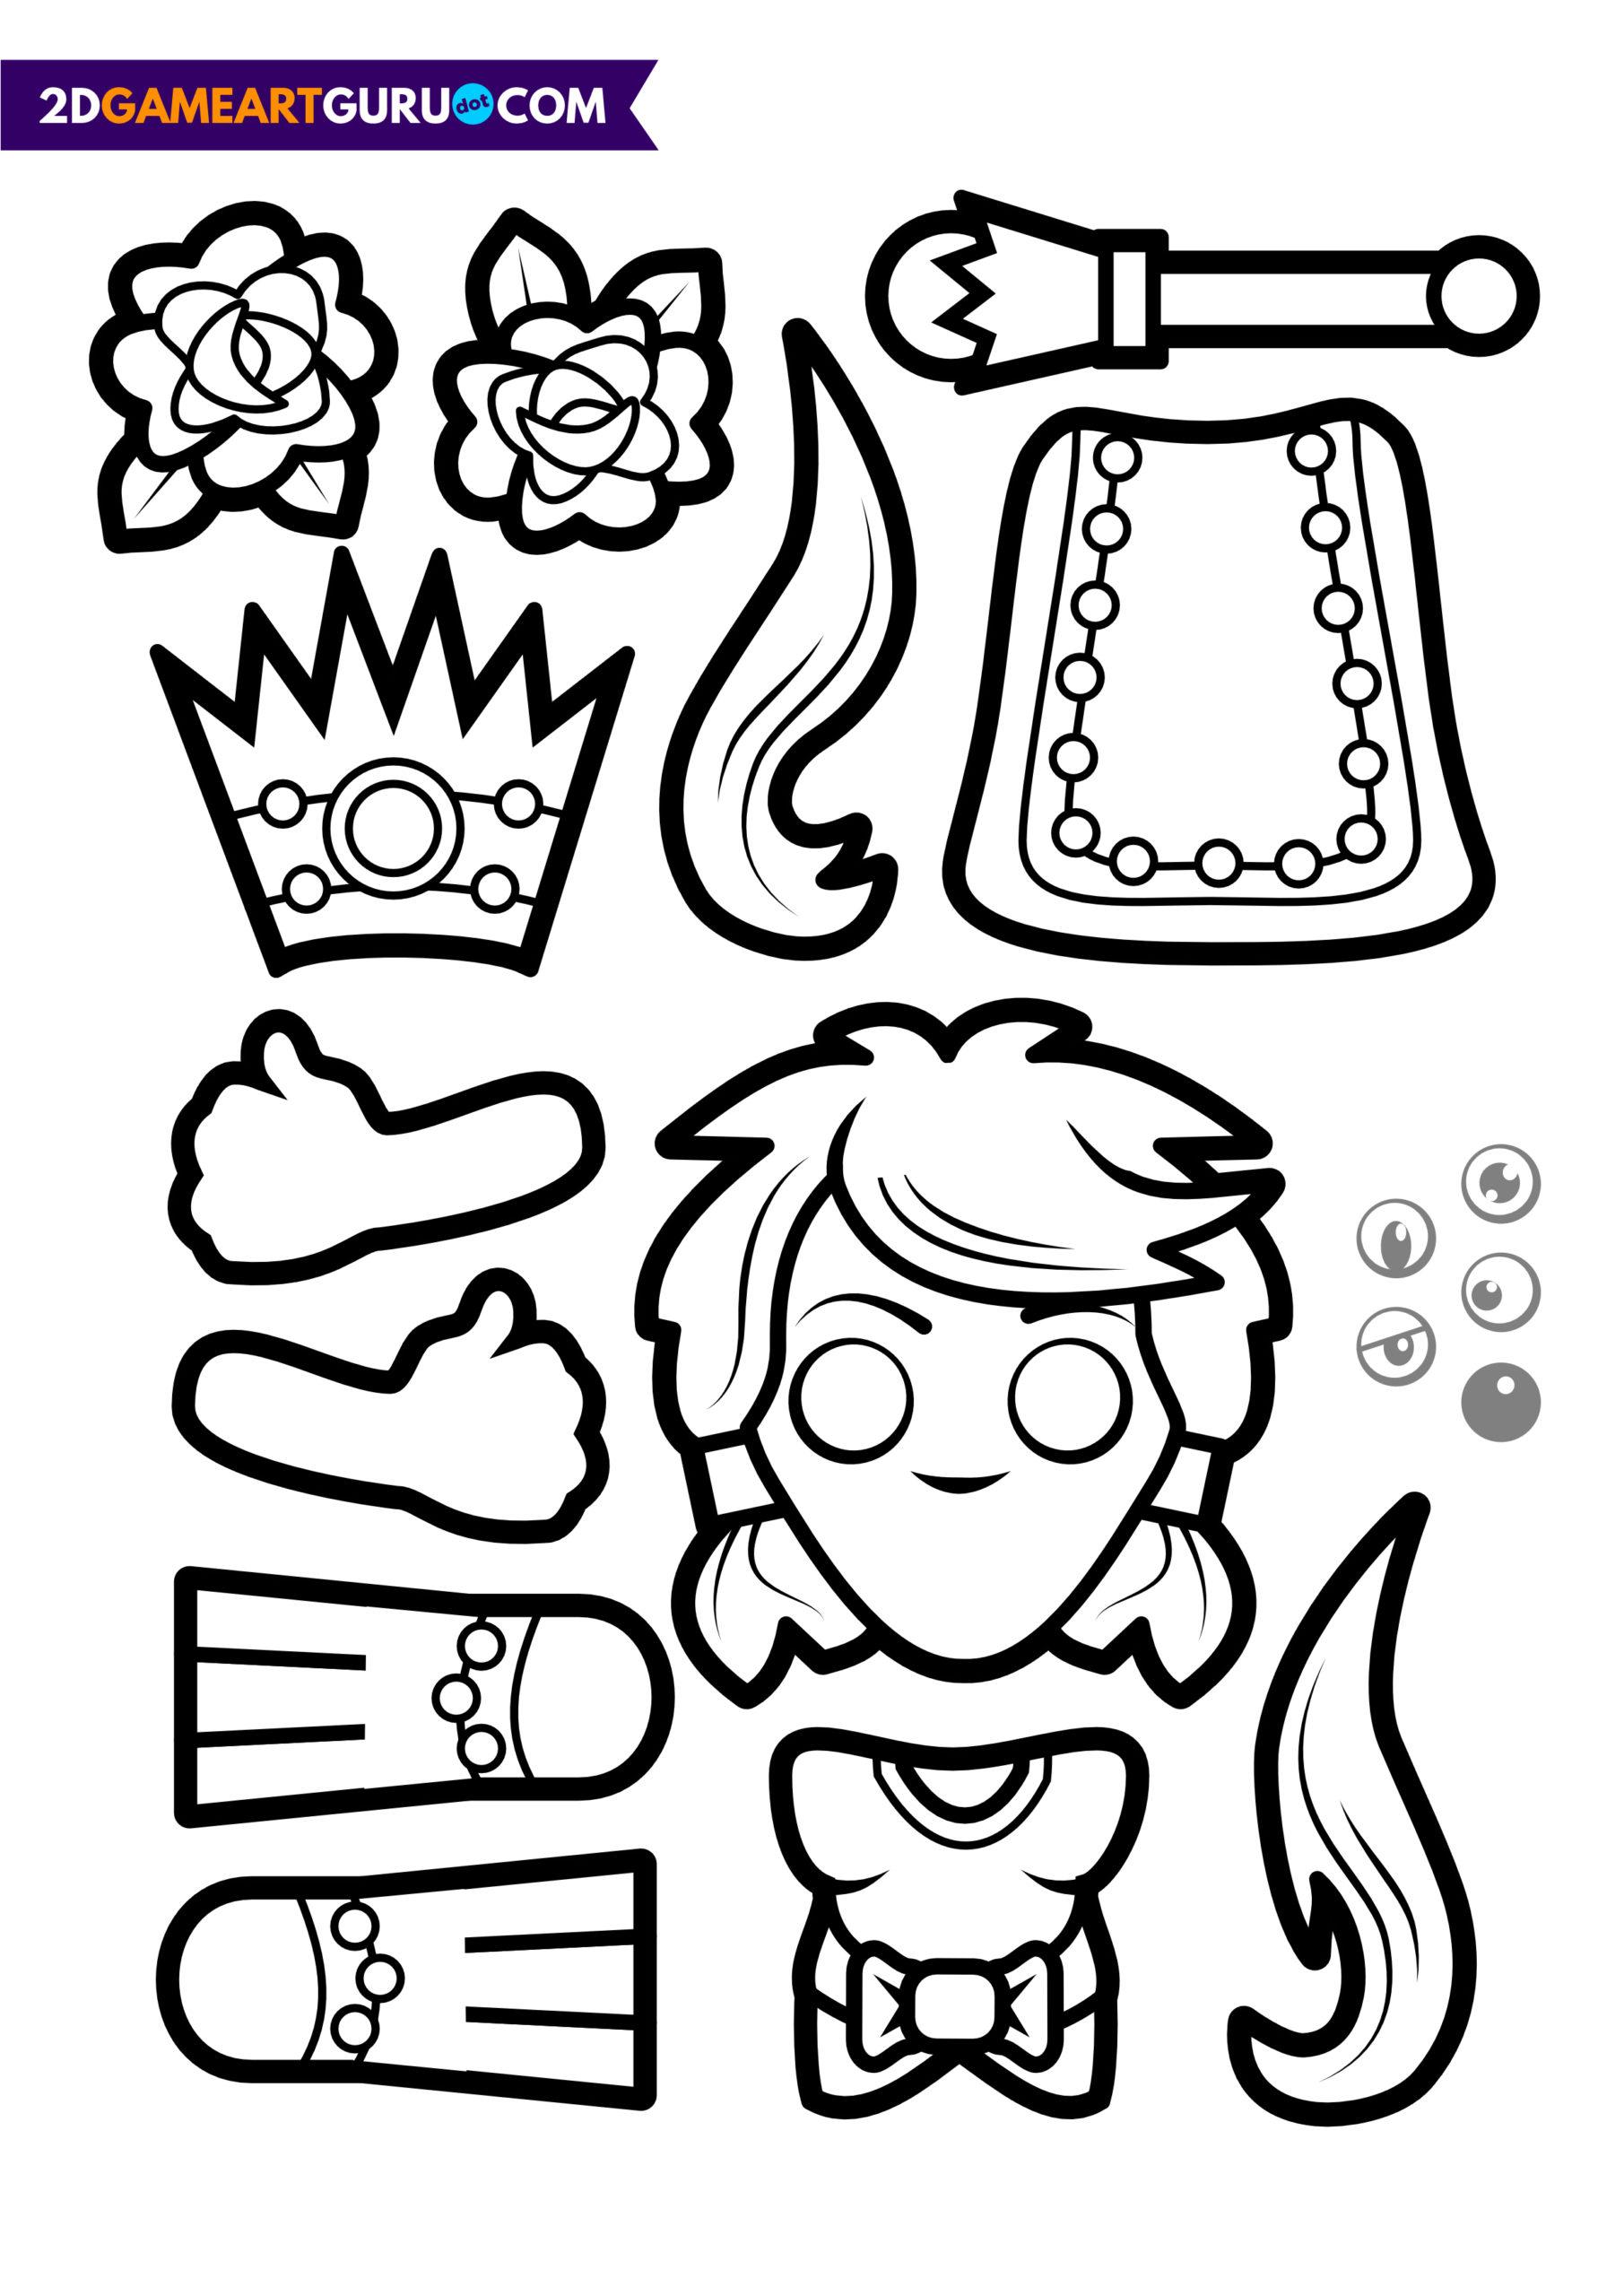 2Dgameartguru - craft sheets princess